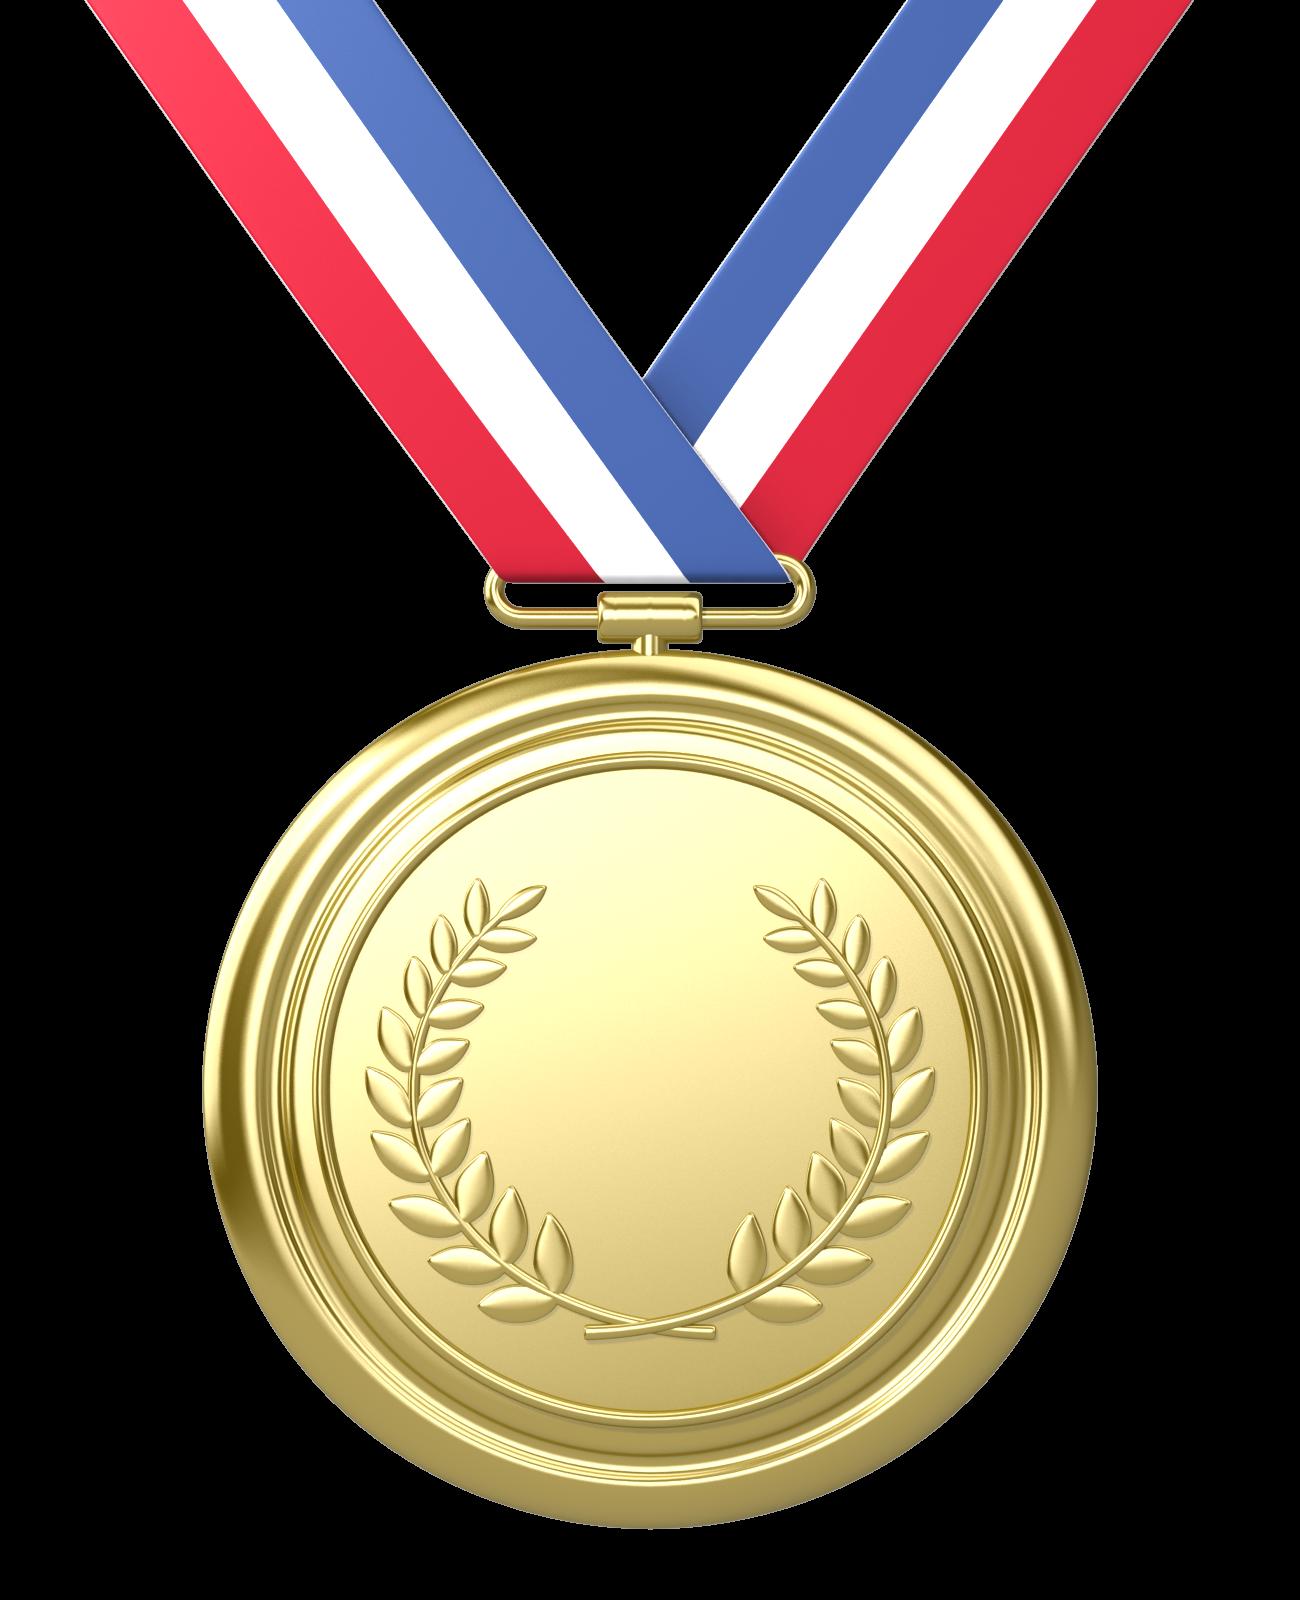 7 Personal Gold Medal Achievements Clip art, Gold, Heart